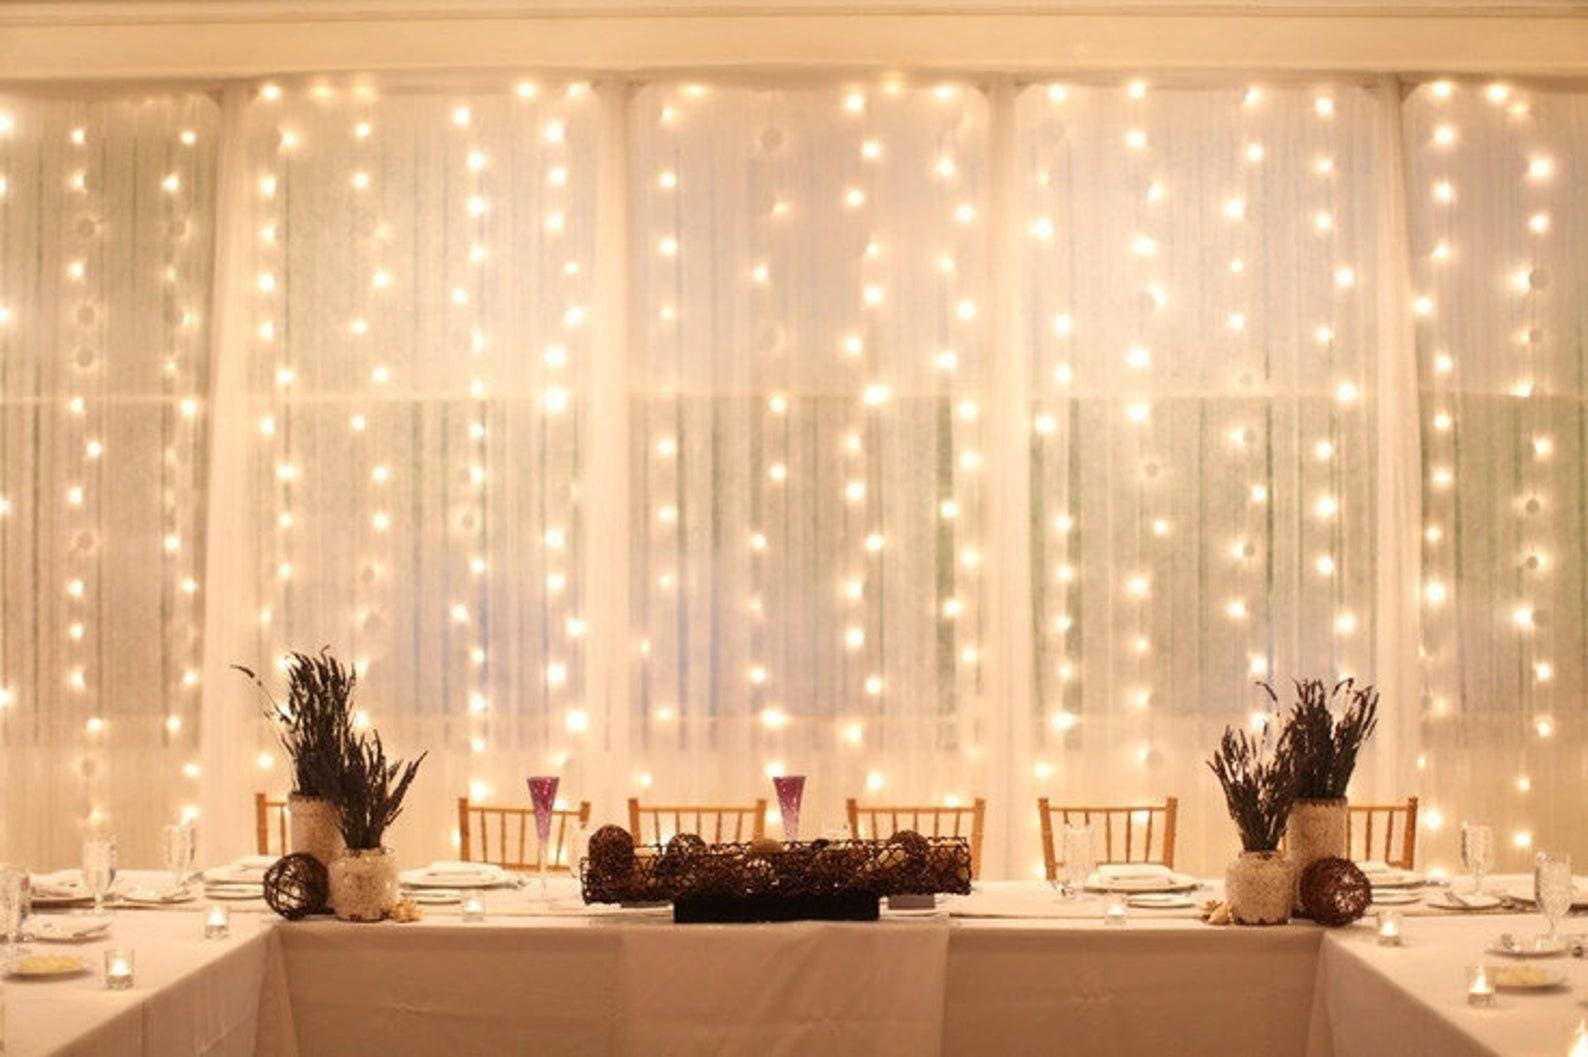 18 Elegant Etsy Christmas Home Decor Ideas in 2020